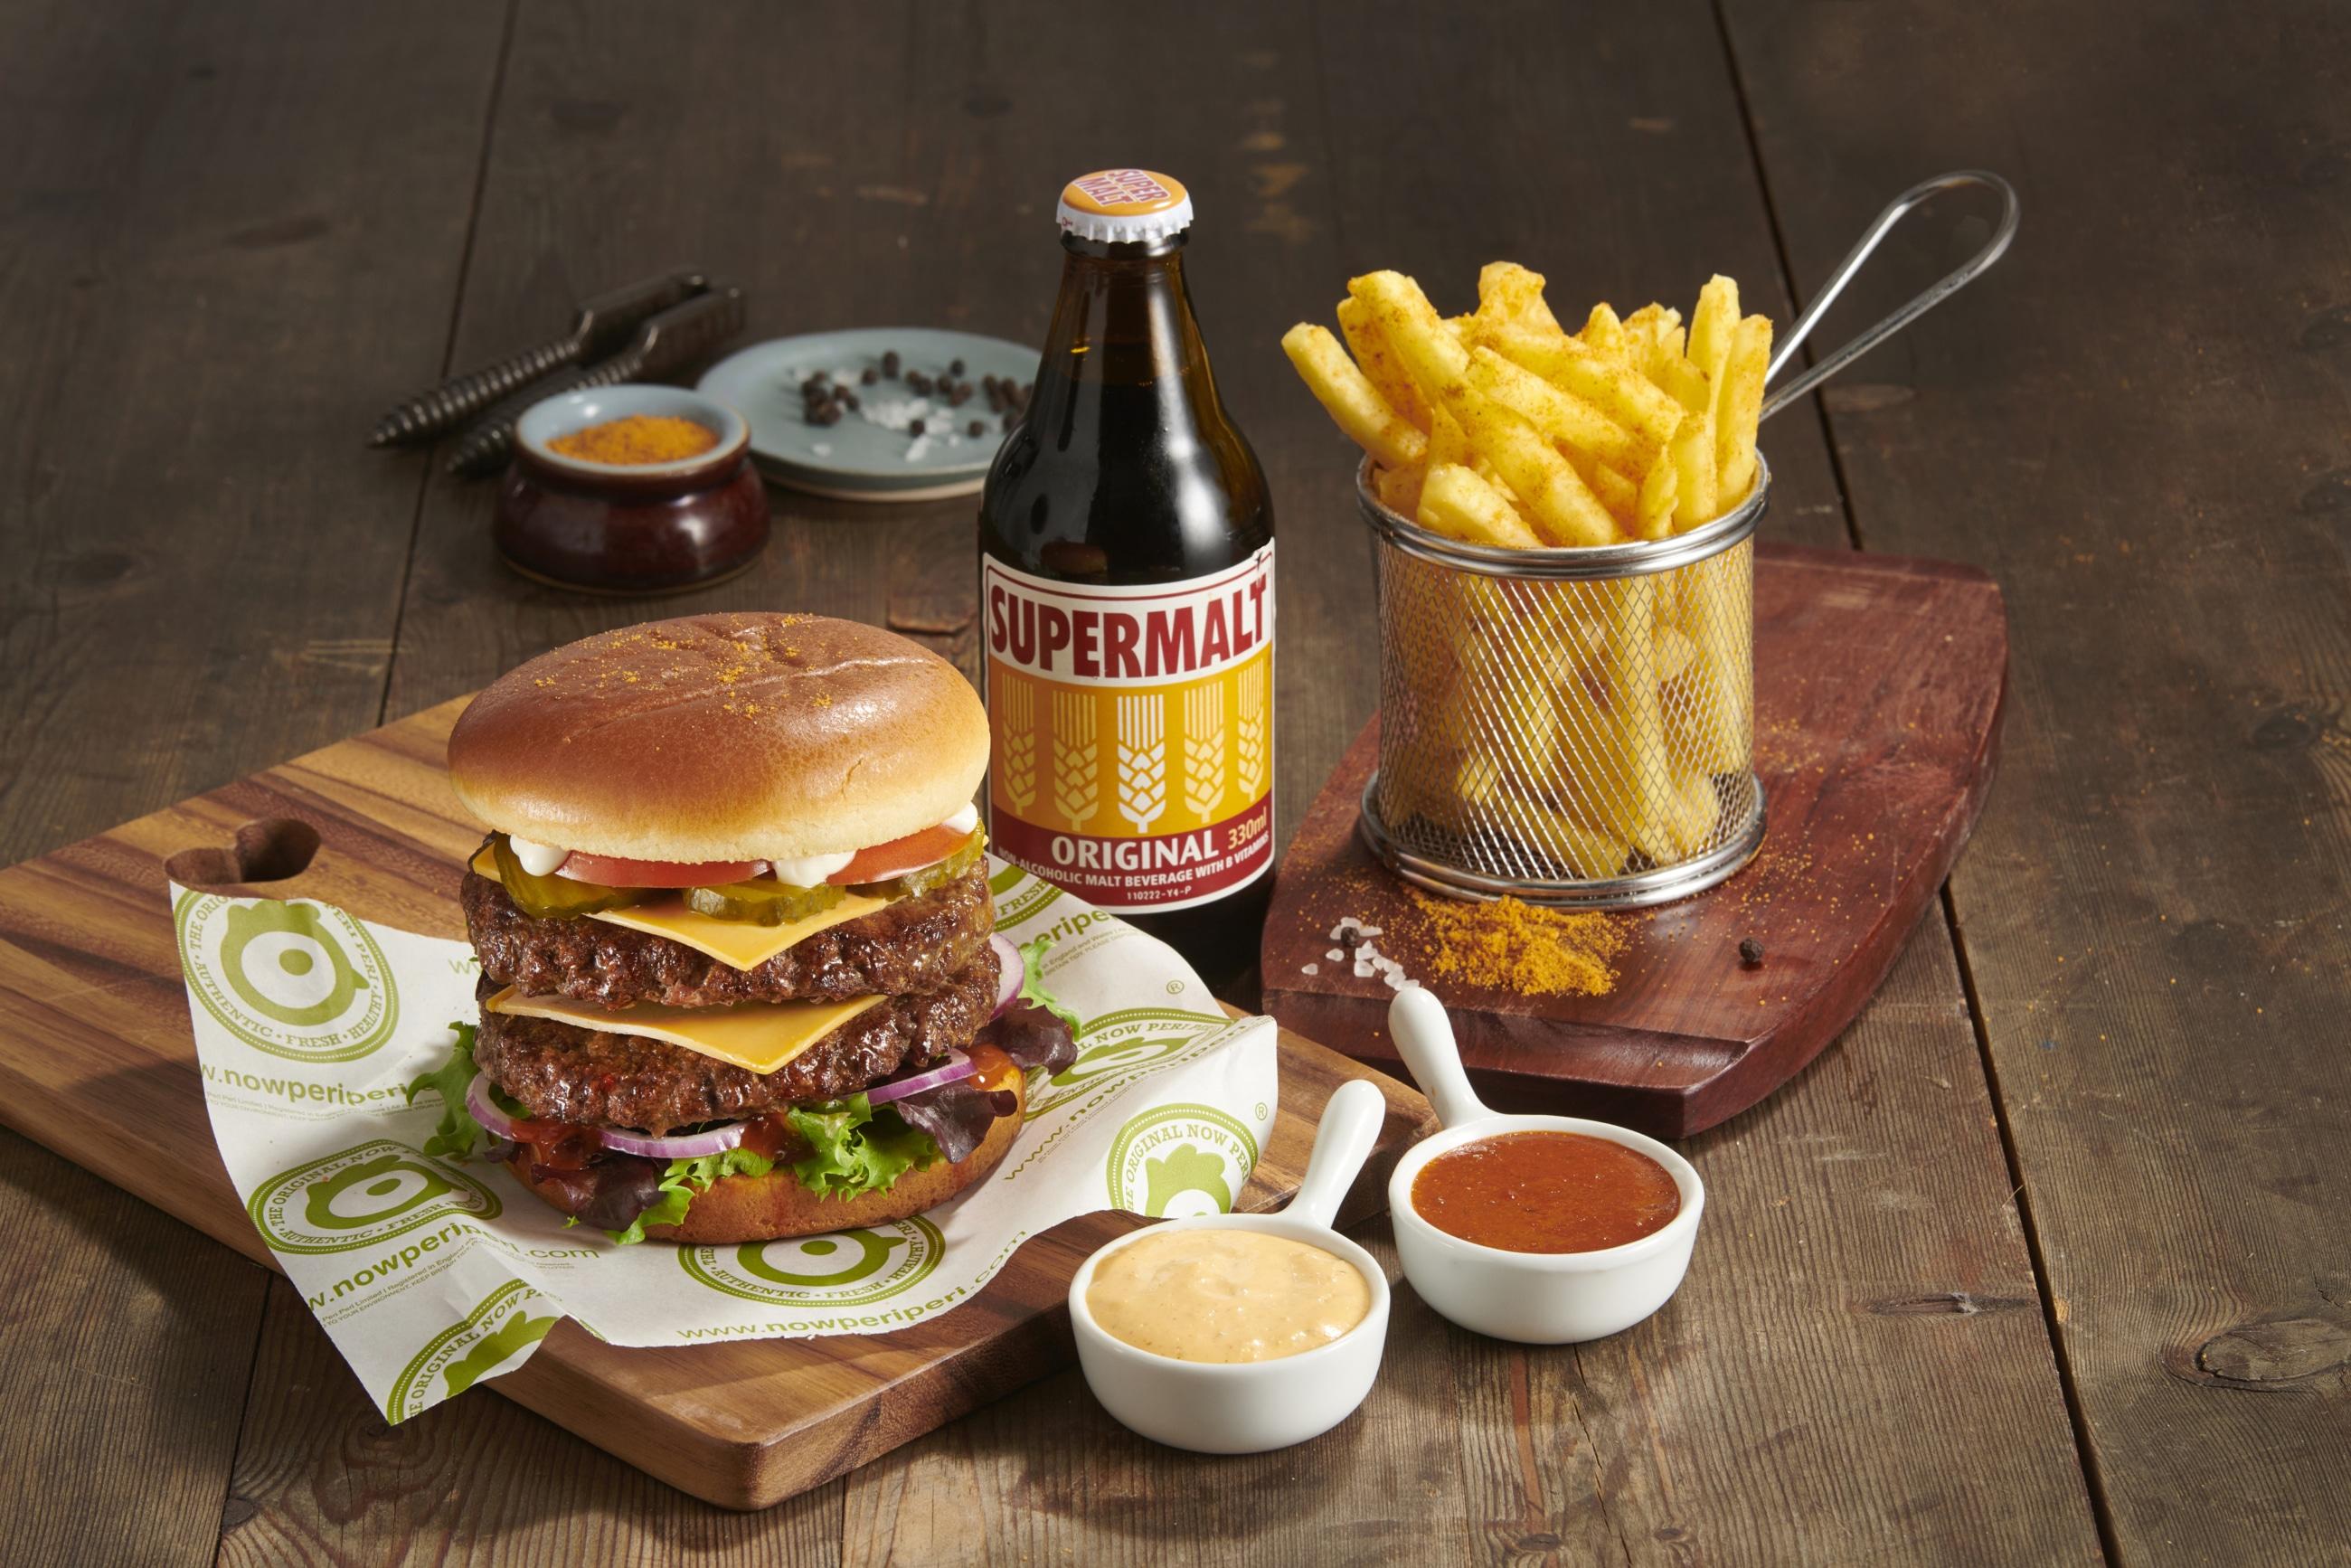 Now Peri Peri Burger Meal Supermalt